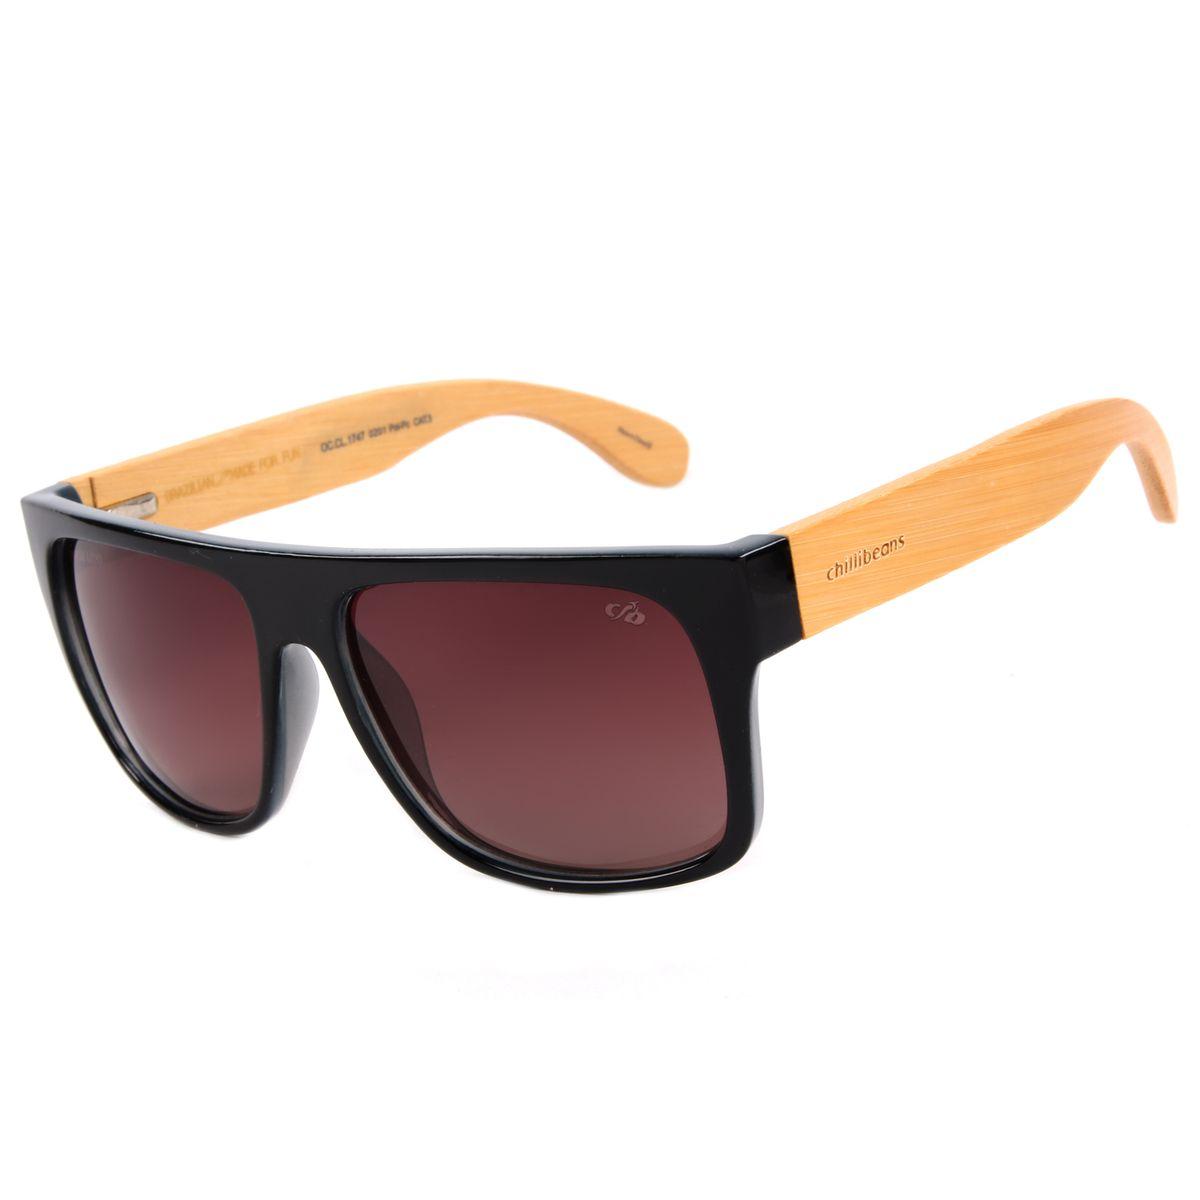 a554c80f3398c Óculos de Sol Masculino Chilli Beans Haste de Bambu Preto Polarizado ...